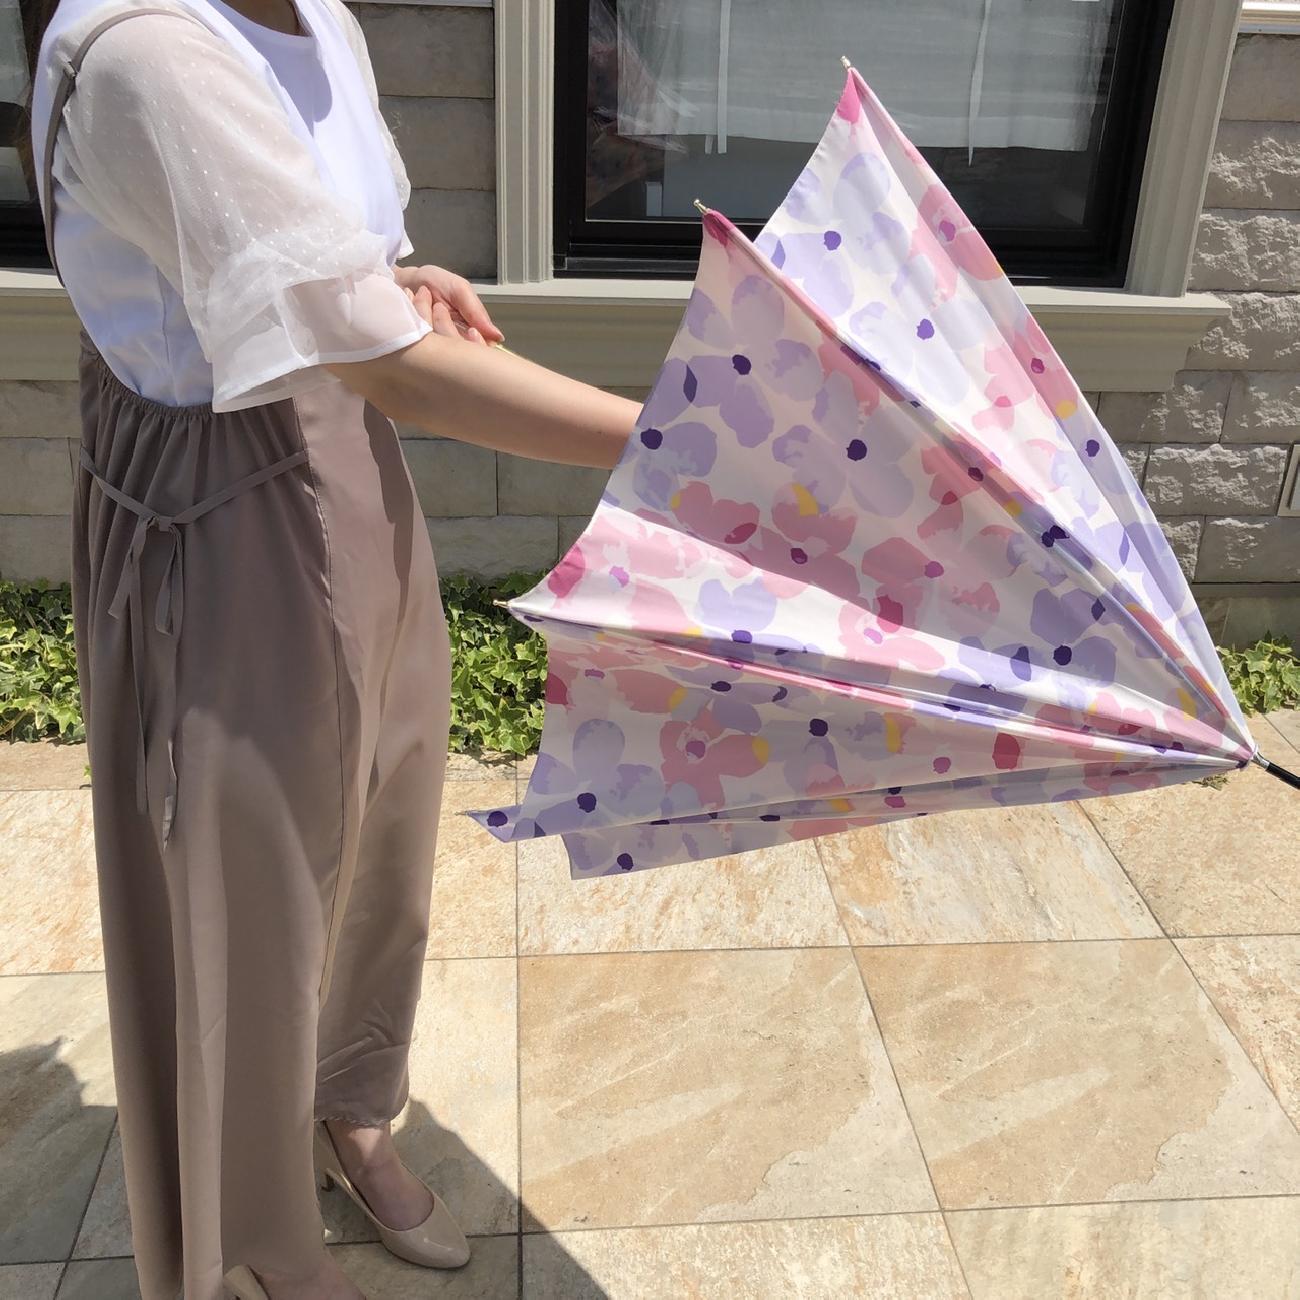 傘/日傘/雨傘/晴雨兼用/花柄/お洒落/晴れ/雨/雑貨屋/津山